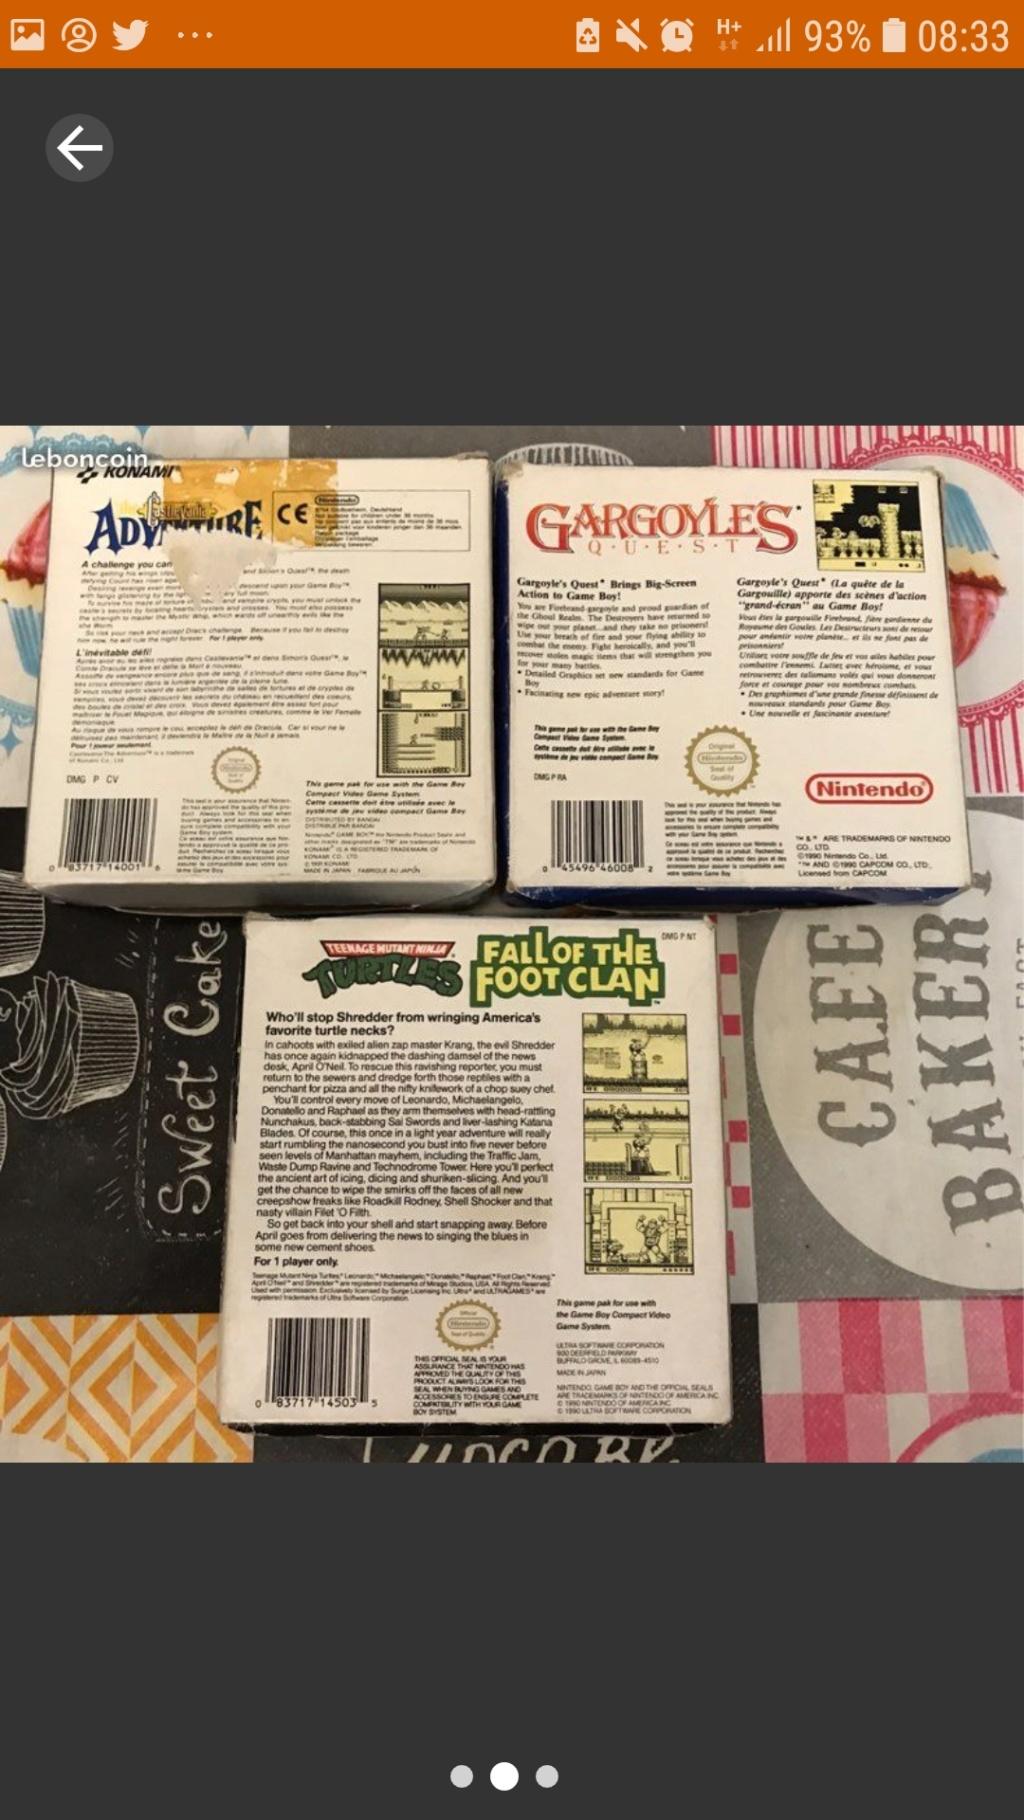 [ESTIM] Jeux Gameboy en boite Castlevania Gargoyle quest et Tortue Ninja Screen27